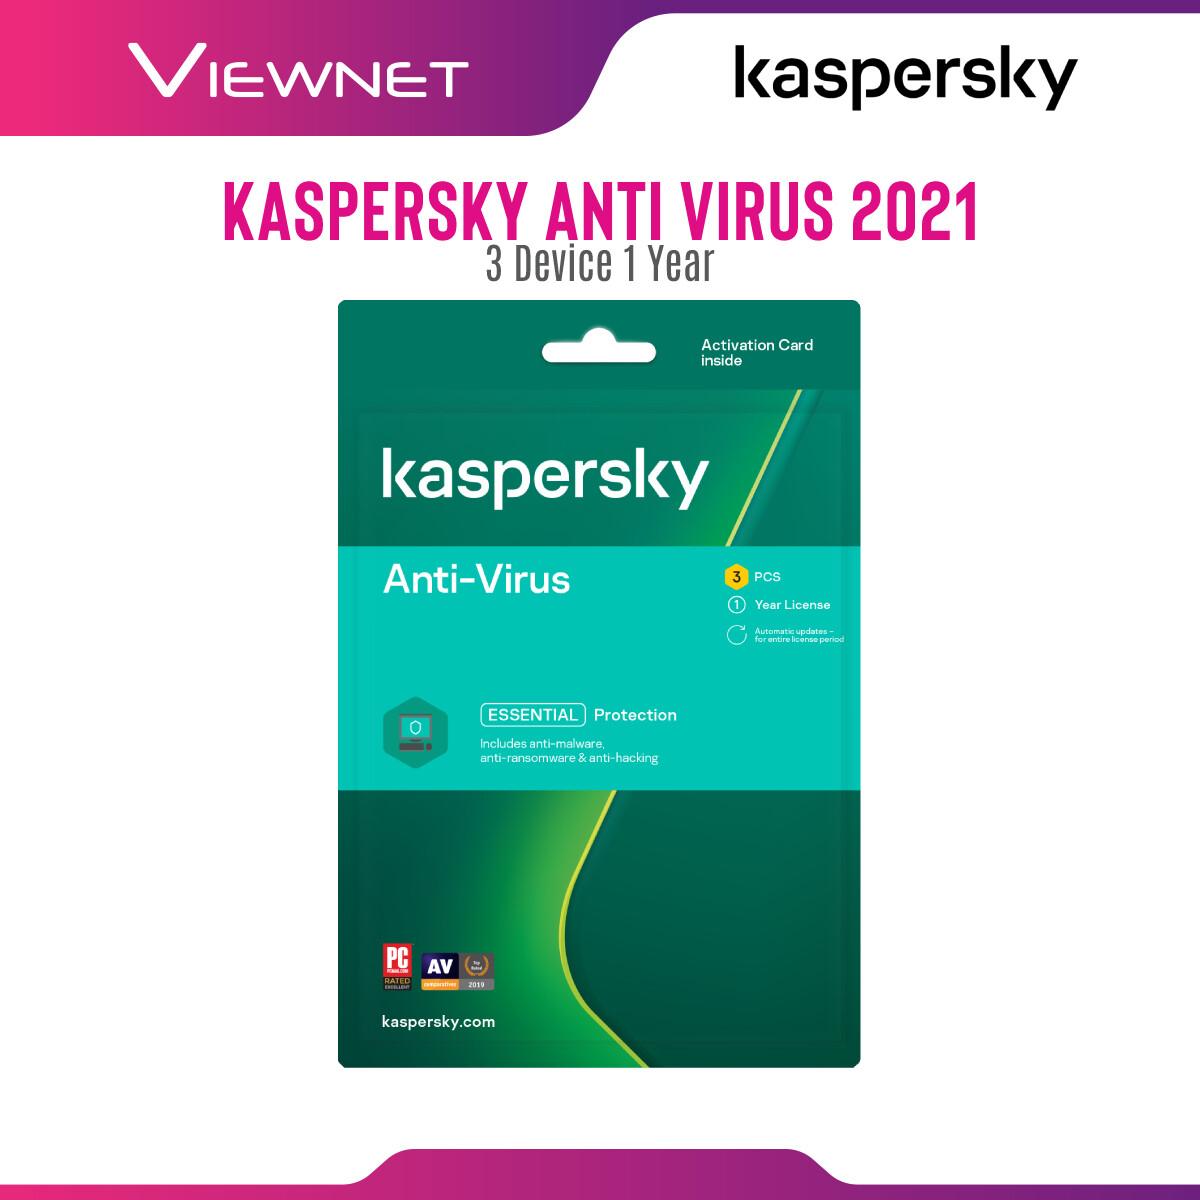 Kaspersky Anti-Virus 3 Device 1 Year License